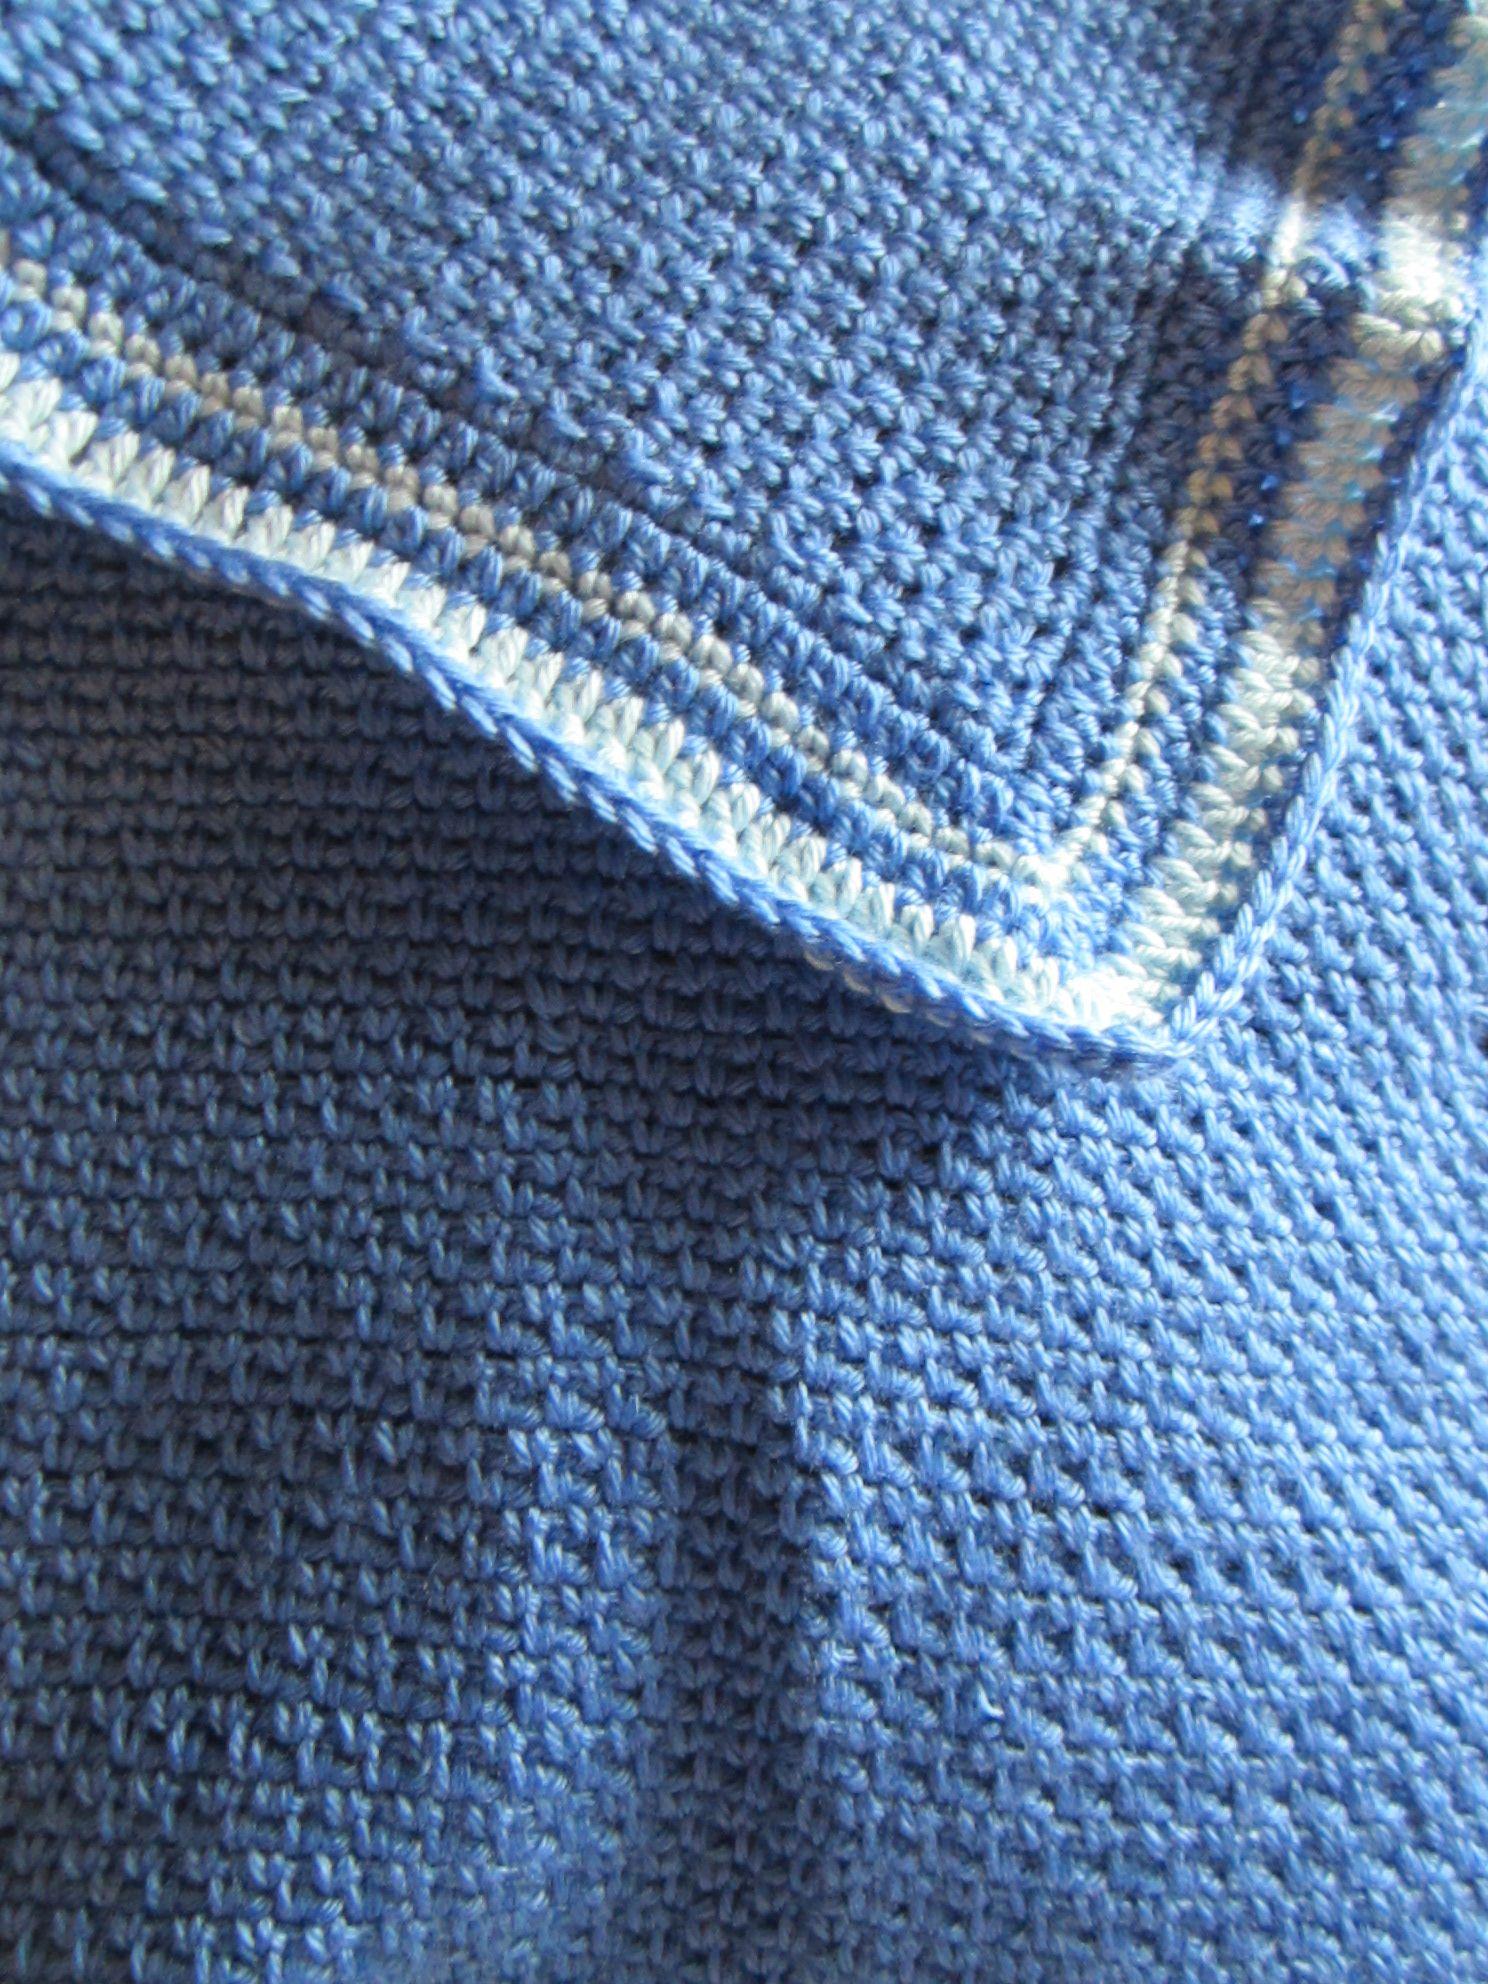 Pin by Ann Barlament on Crochet for Charity Pinterest